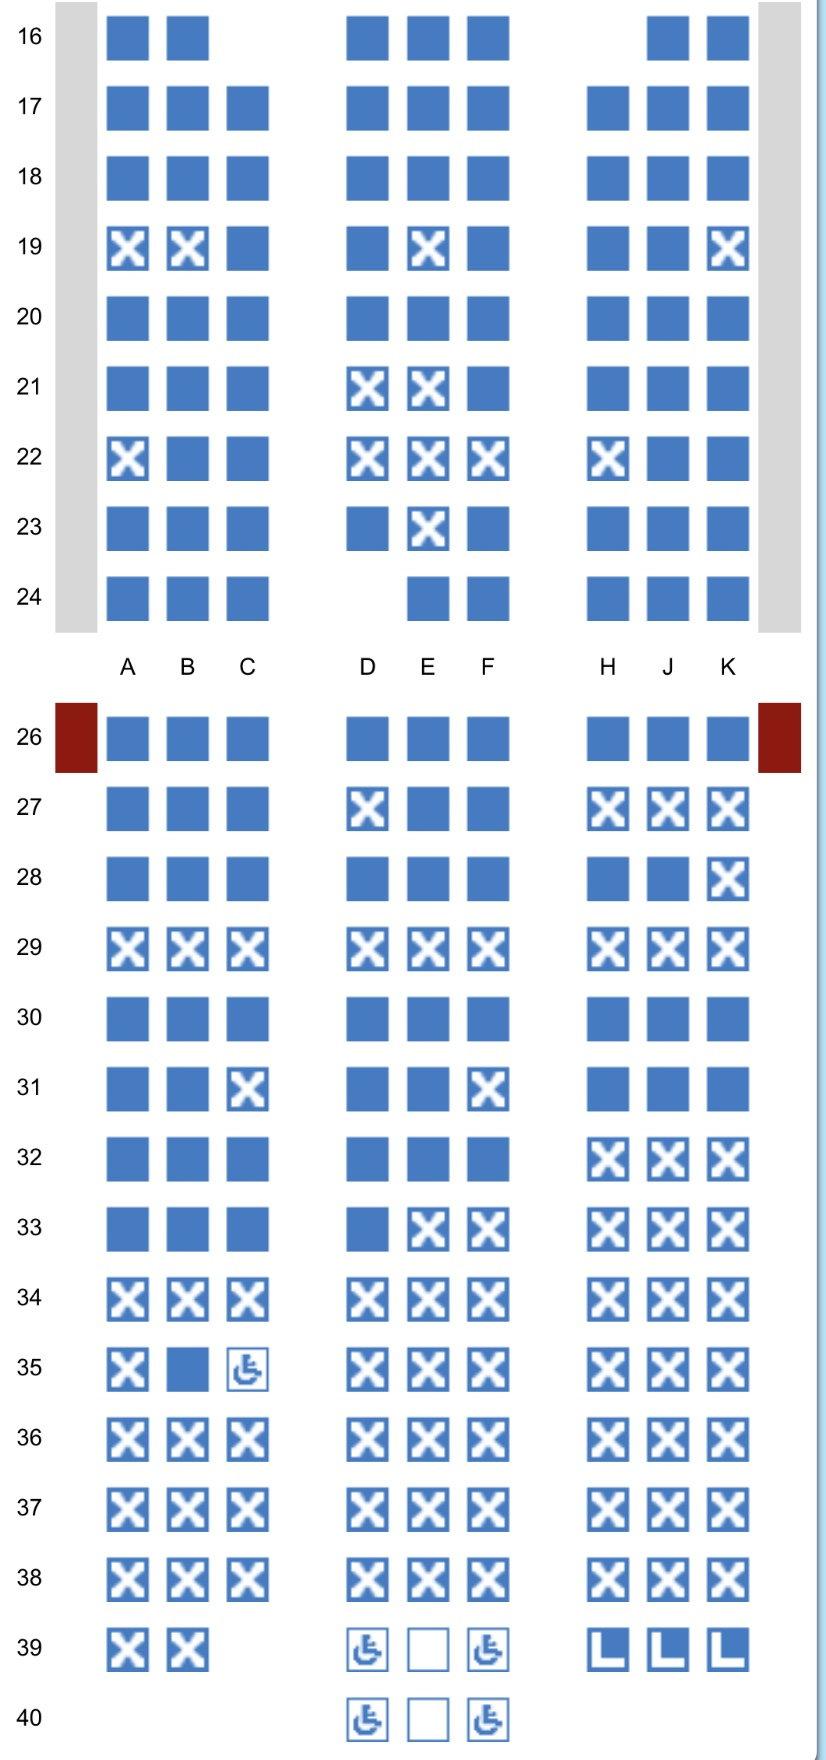 WTP seat map full but 5 avios seats - FlyerTalk Forums